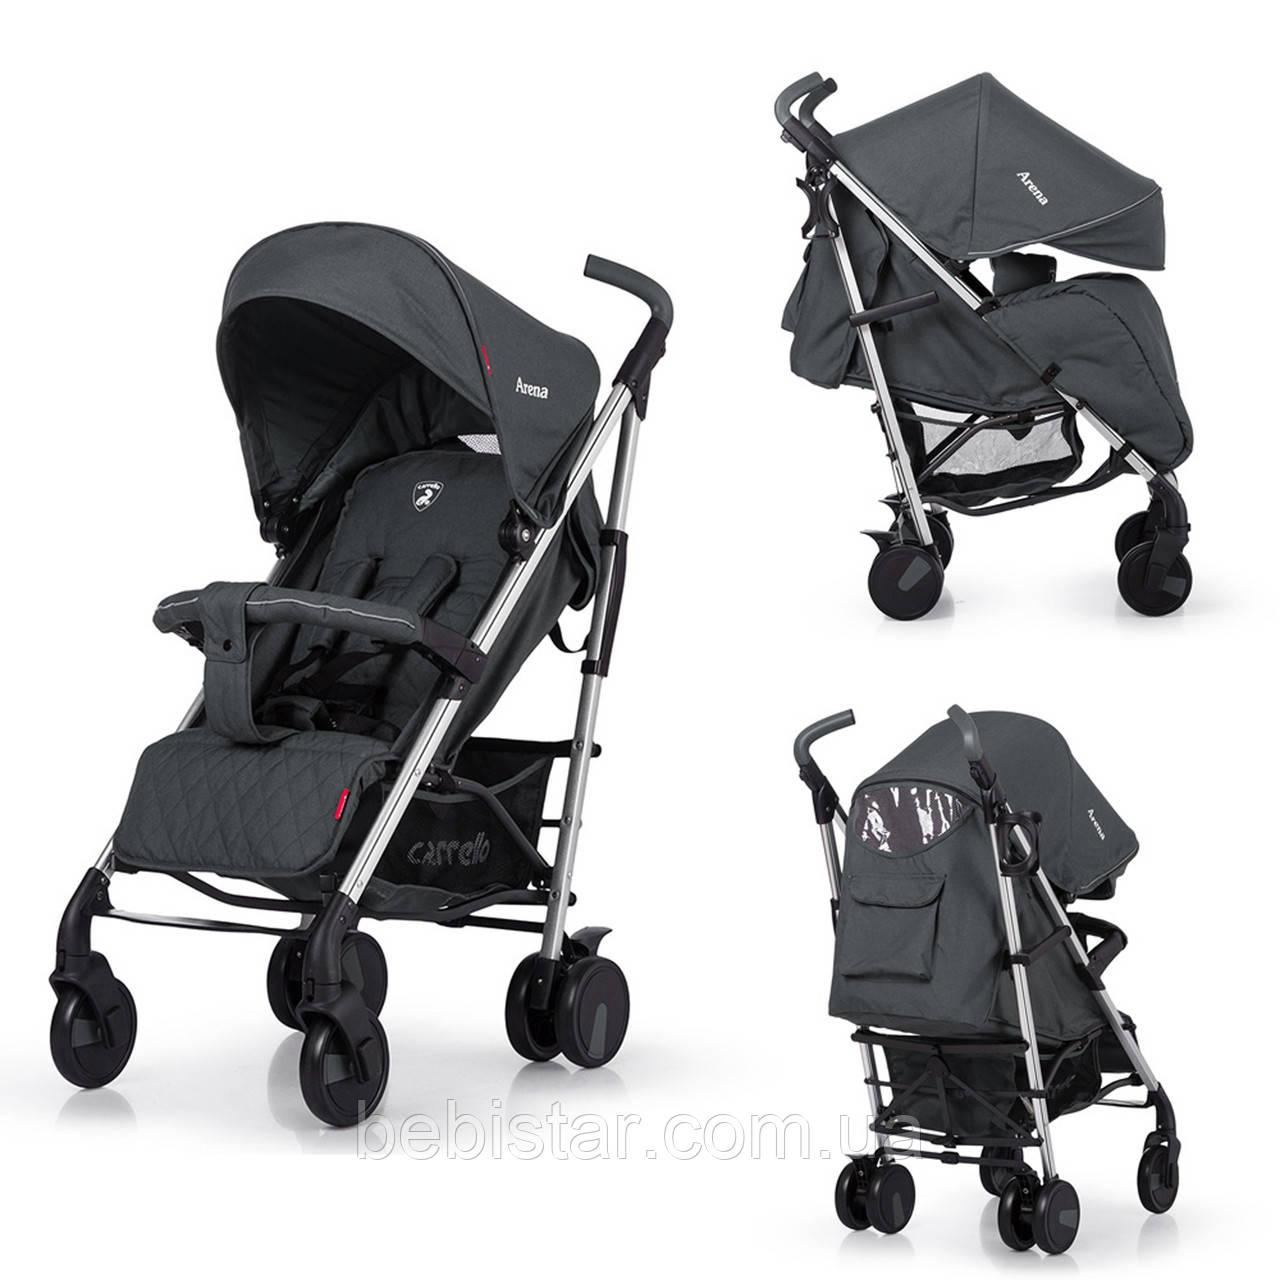 Прогулянкова дитяча коляска-тростина CARRELLO Arena CRL-8504 Storm Gray в льоні